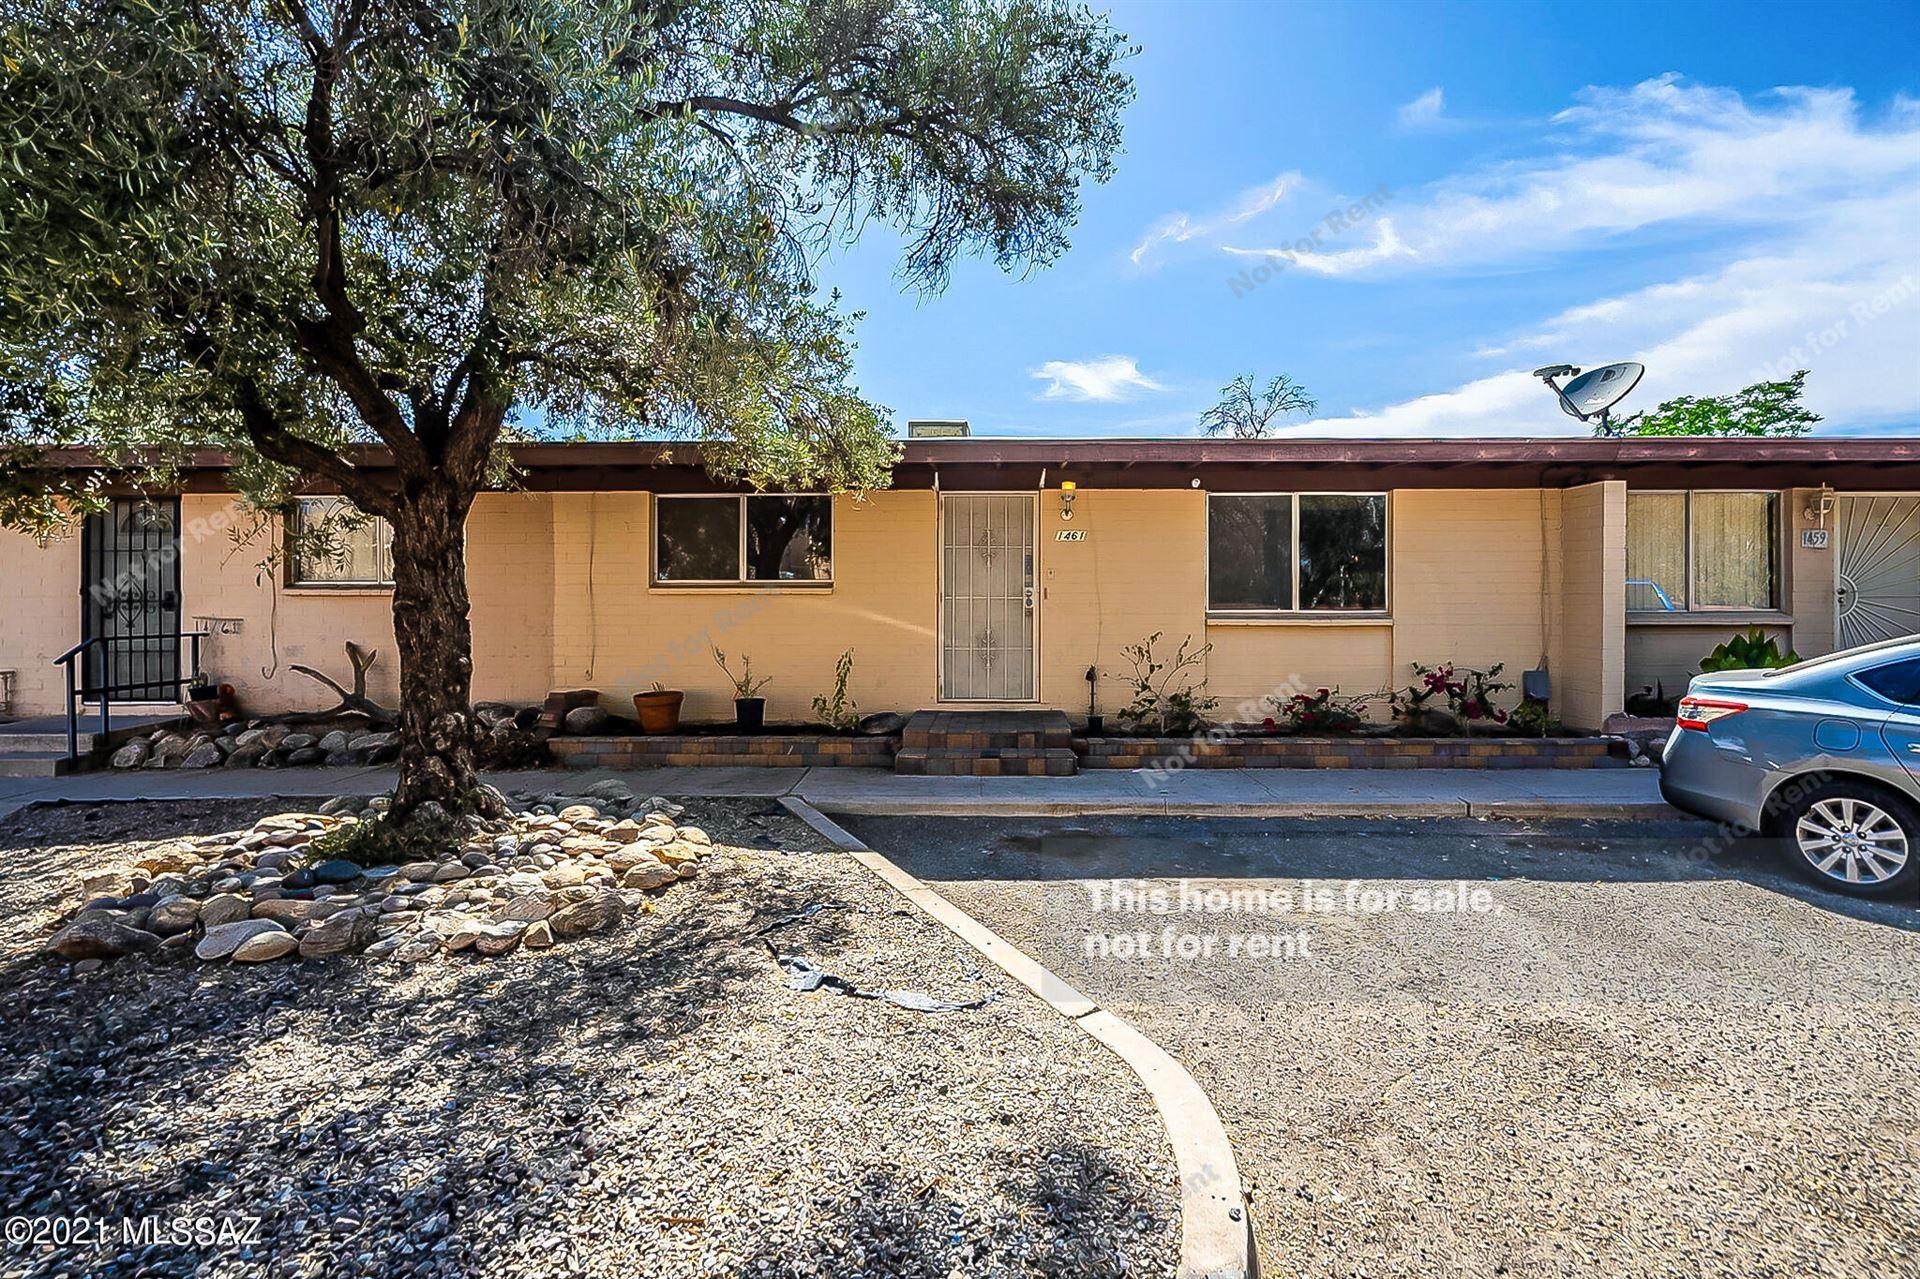 1461 W Roger Road, Tucson, AZ 85705 - MLS#: 22114778